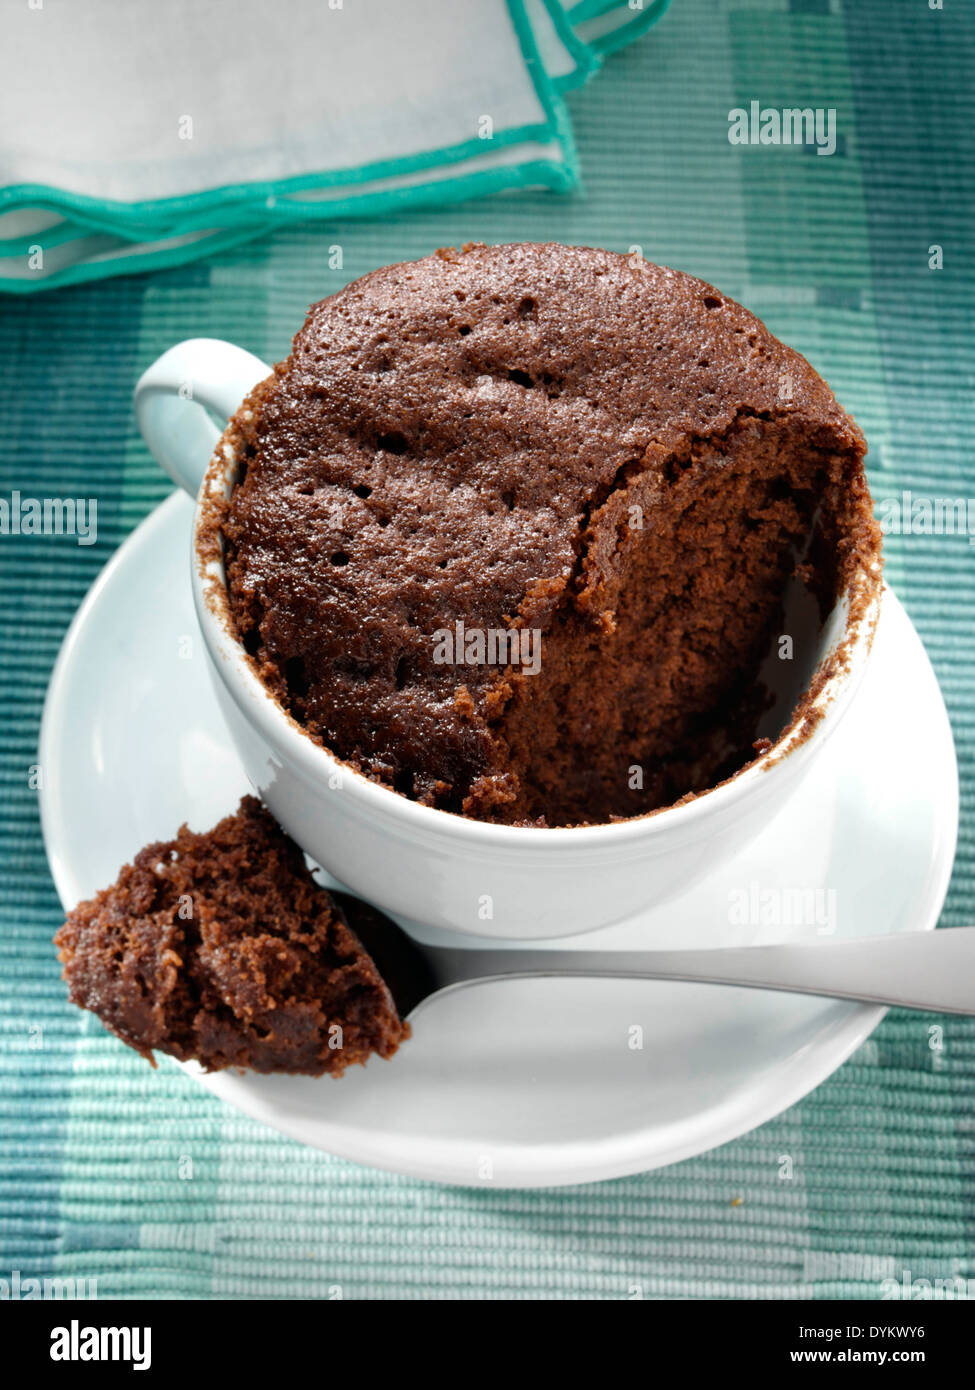 Squidgy chocolate cake - Stock Image